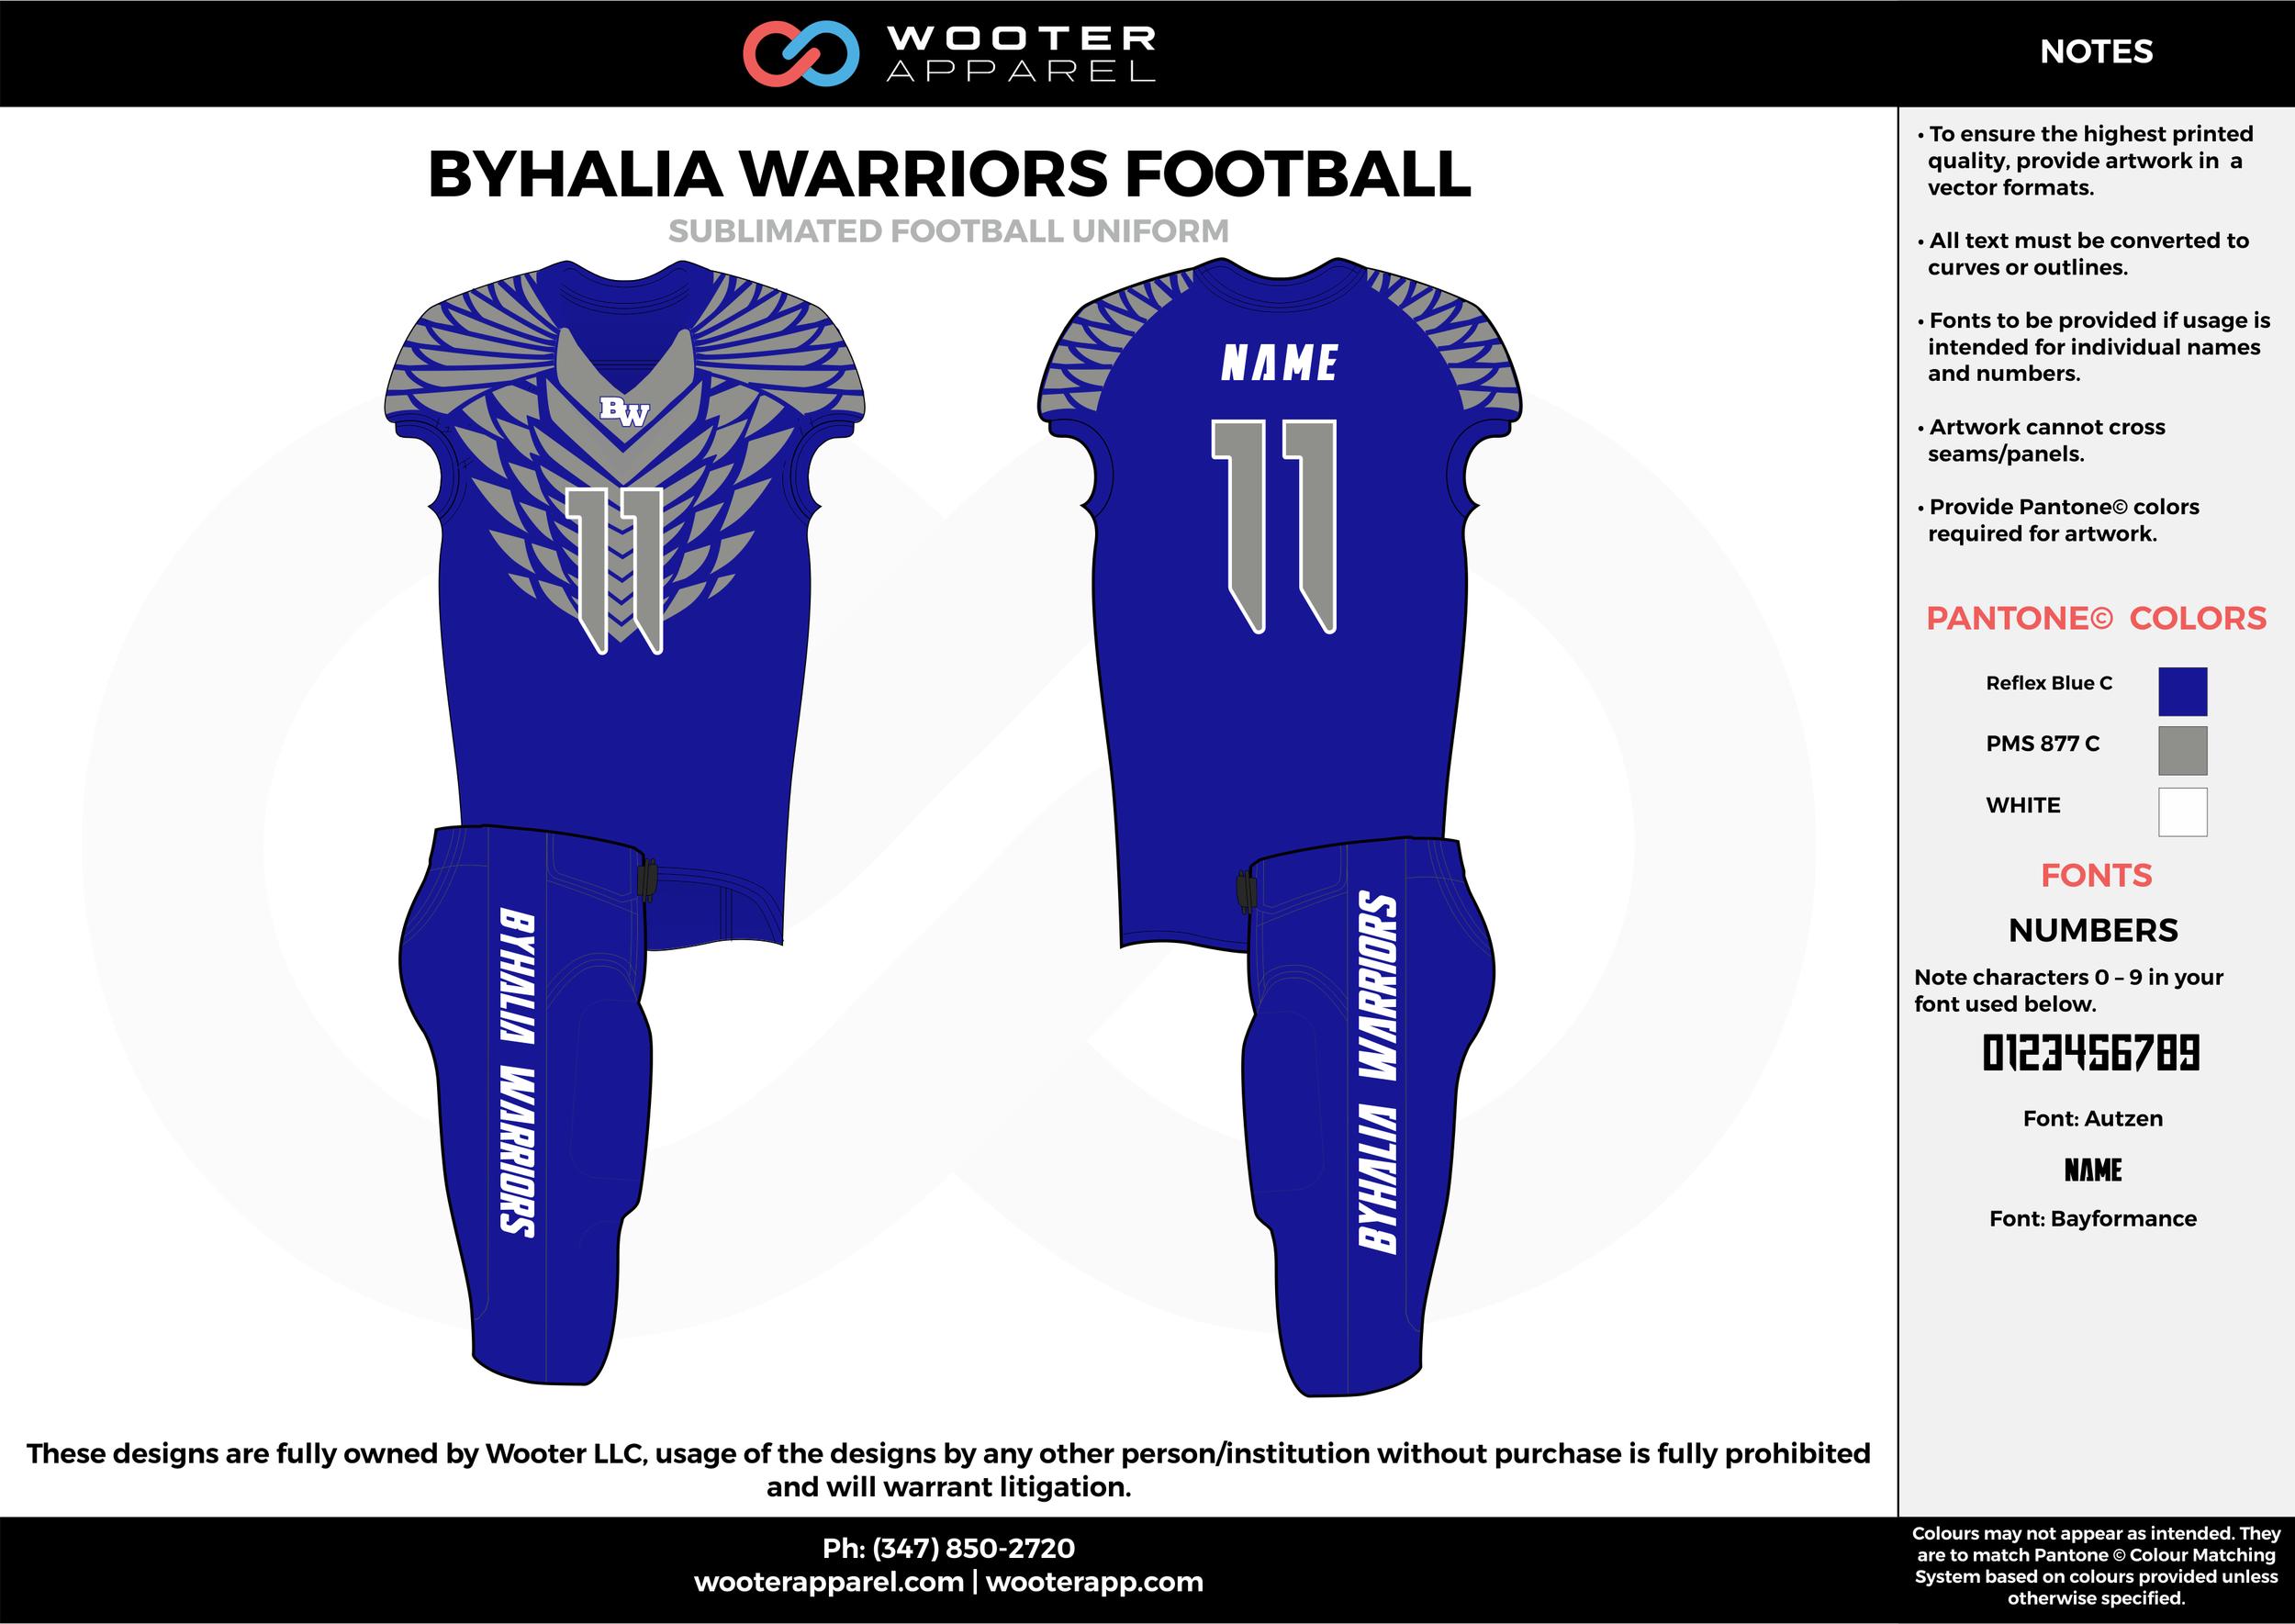 BYHALIA WARRIORS FOOTBALL blue gray white football uniforms jerseys pants